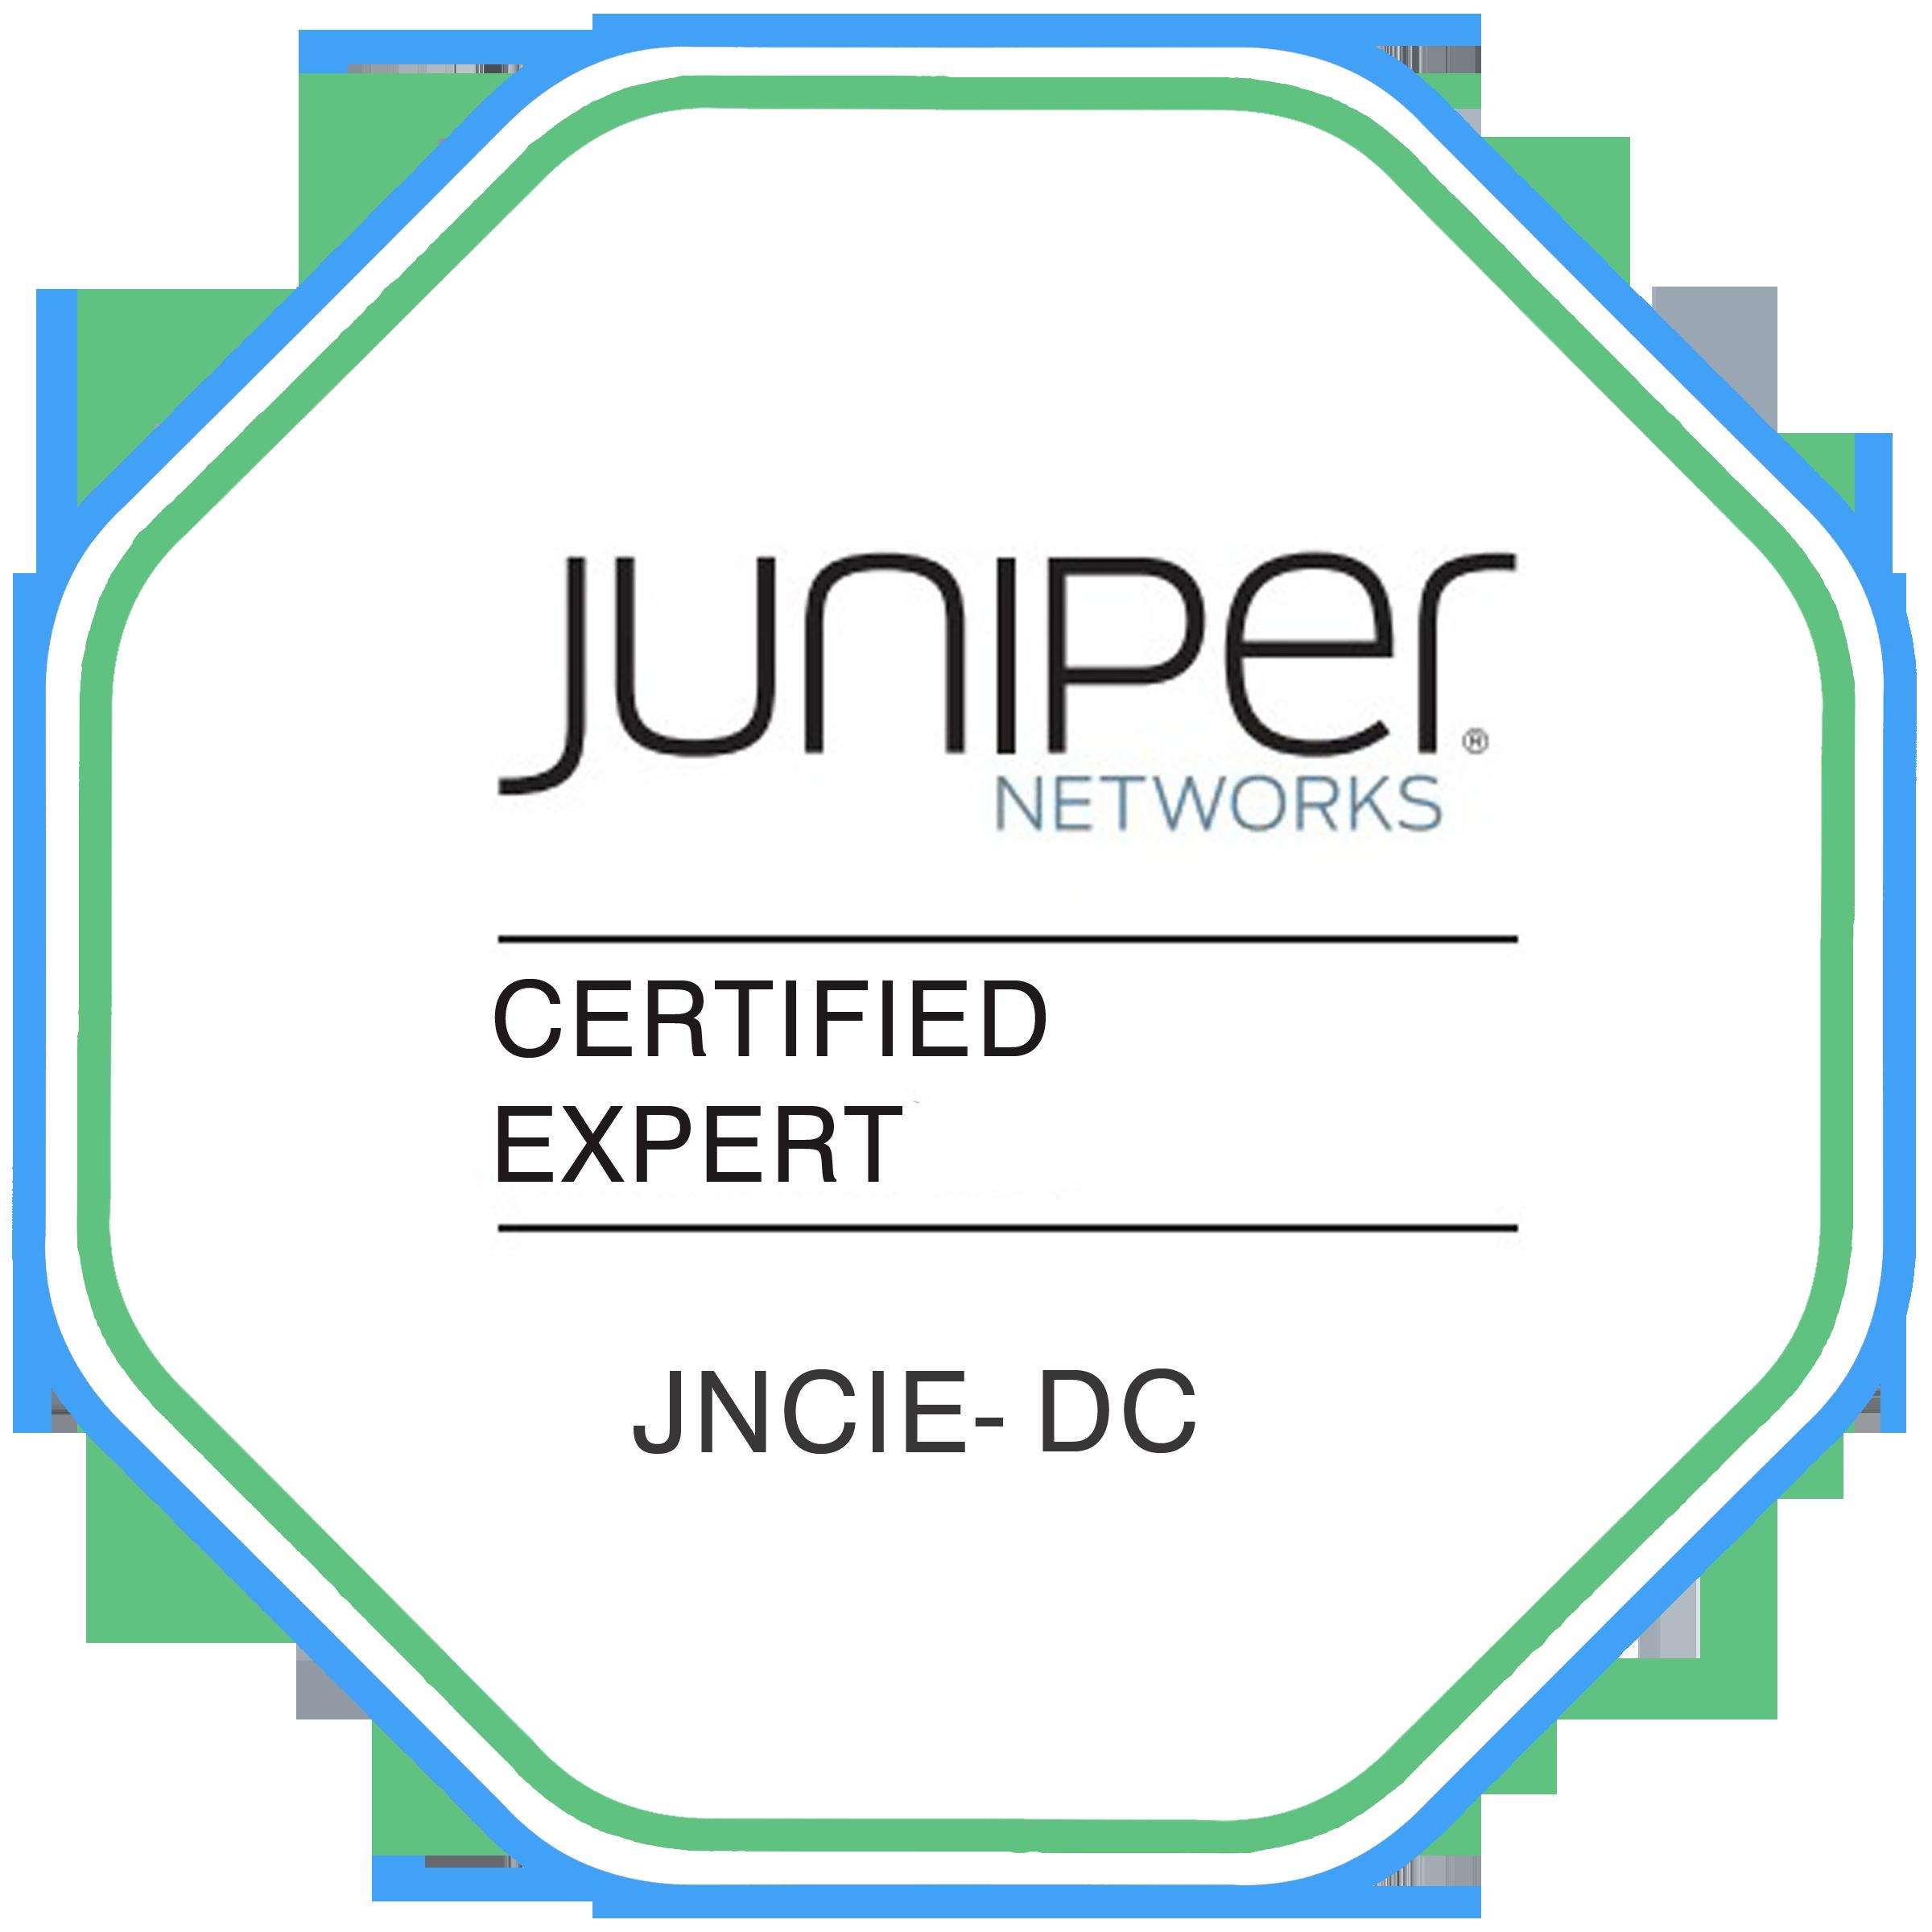 Data Center Certification TRACK - JNCIE- DC